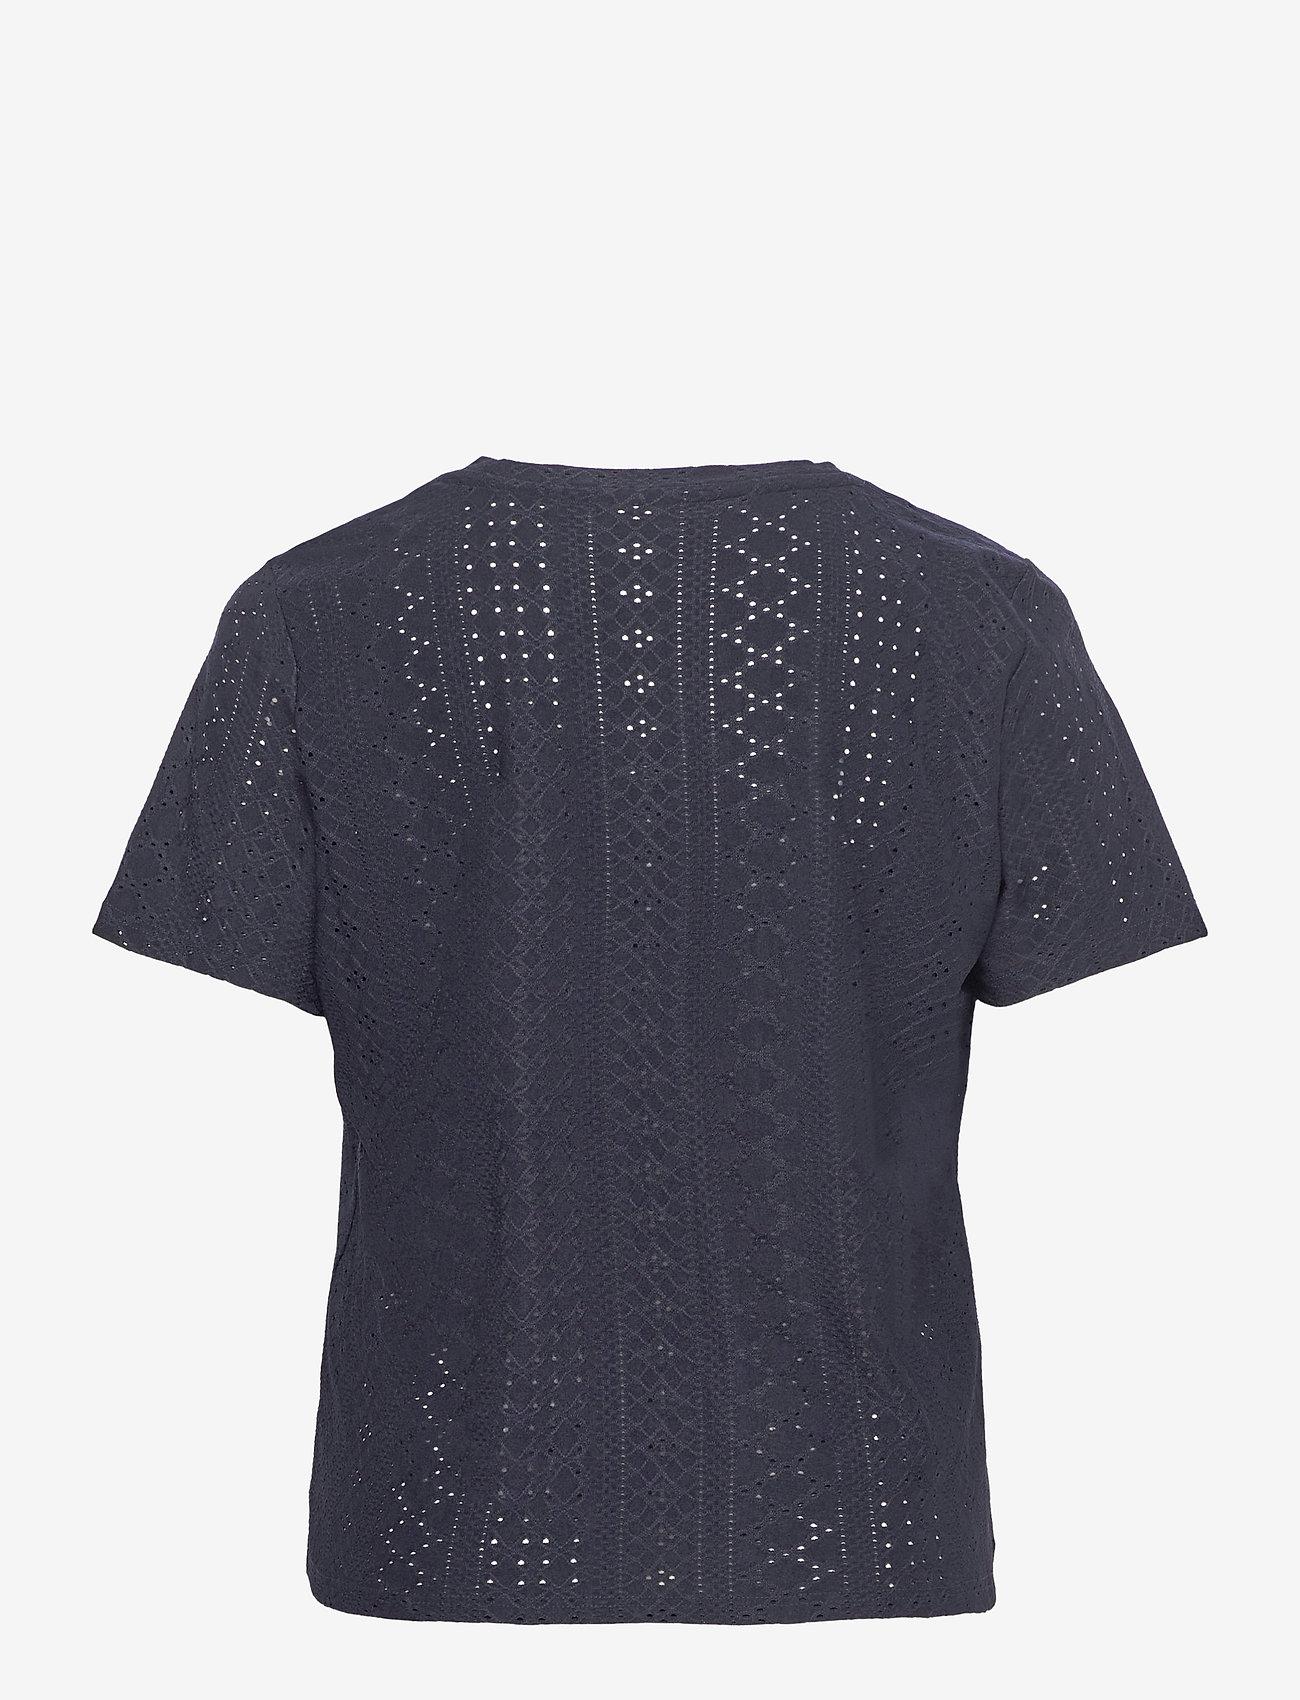 ONLY Carmakoma - CARSILJE SS TOP - t-shirts - night sky - 1